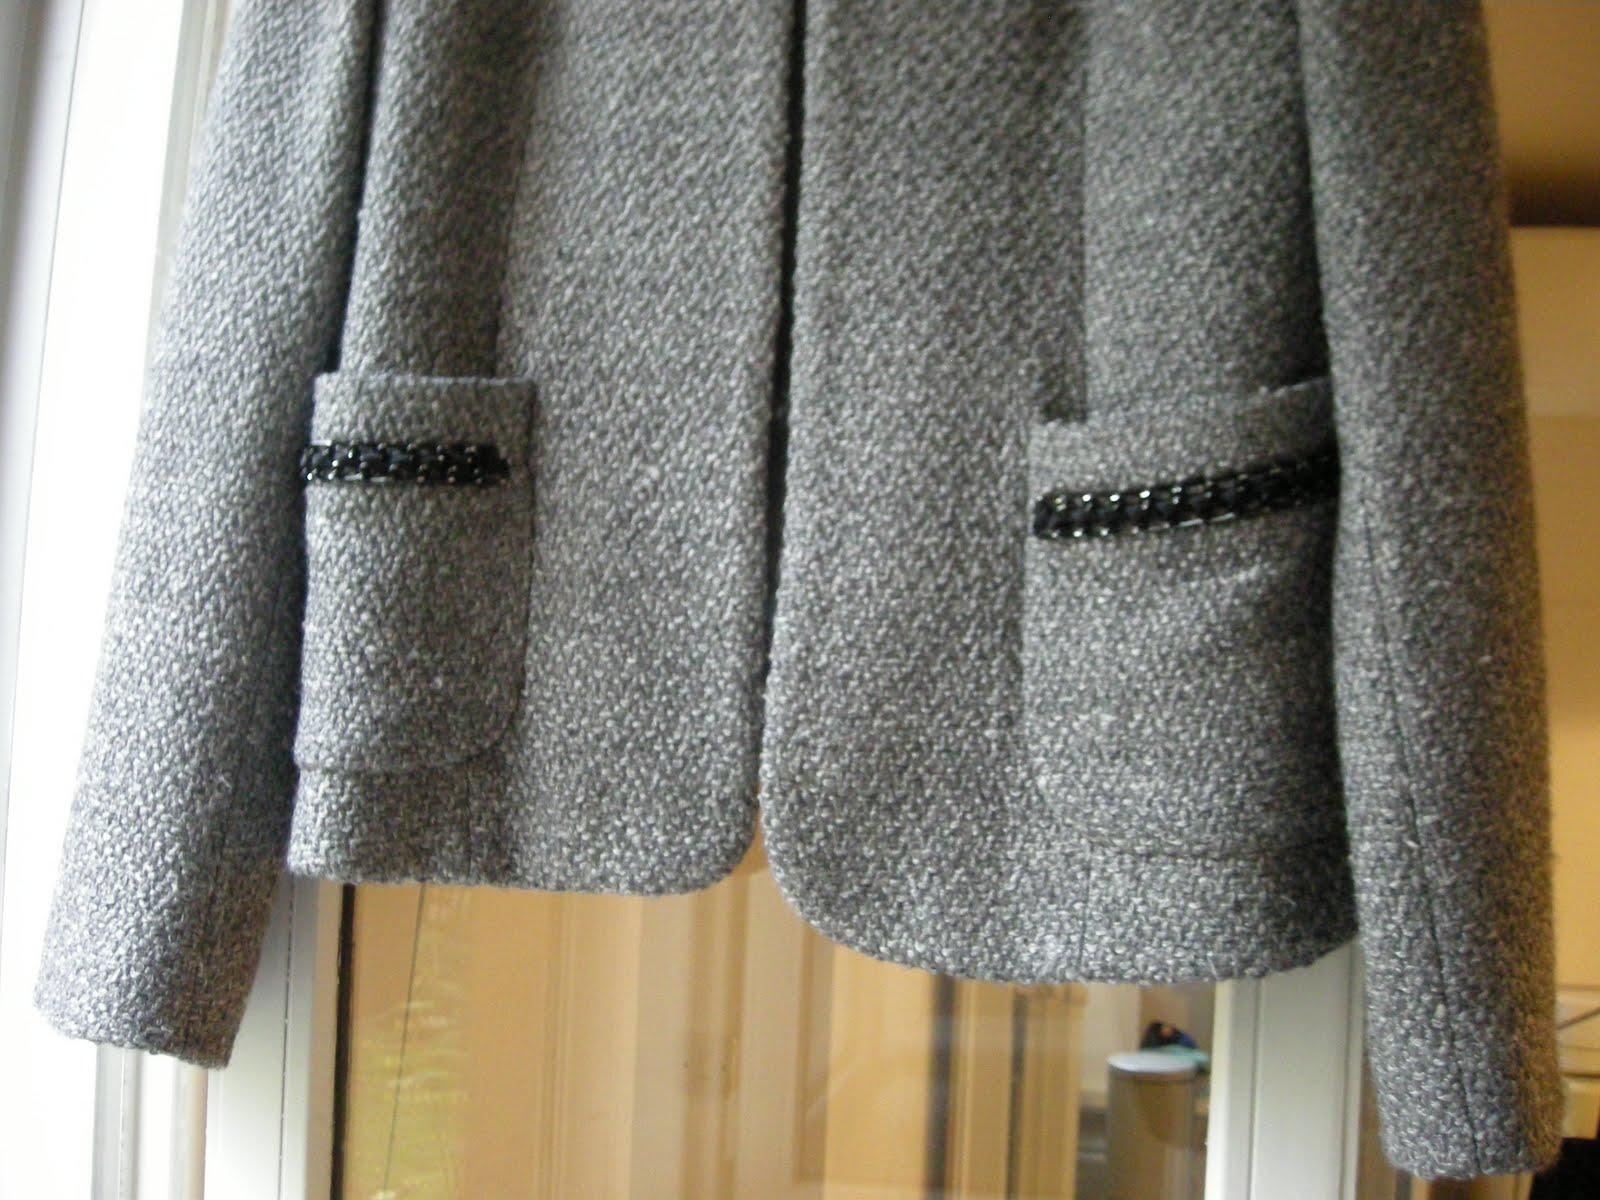 vente vetement en ligne vide dressing Flora : SANDRO – Veste costume grise « Chanel » 35% laine - T40 - NEUVE